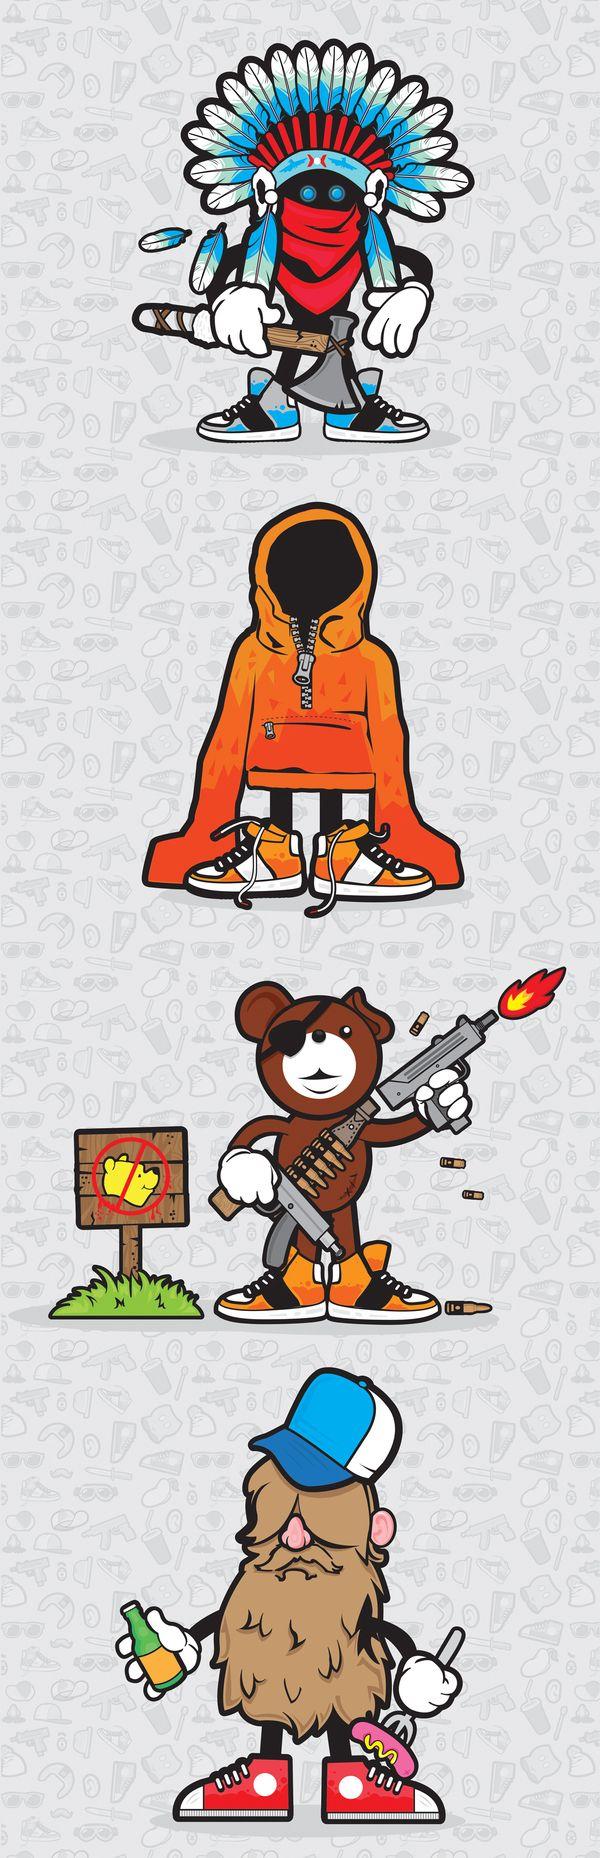 Character design 2 by Justyna Olejniczak, via BehanceCharacterdesign